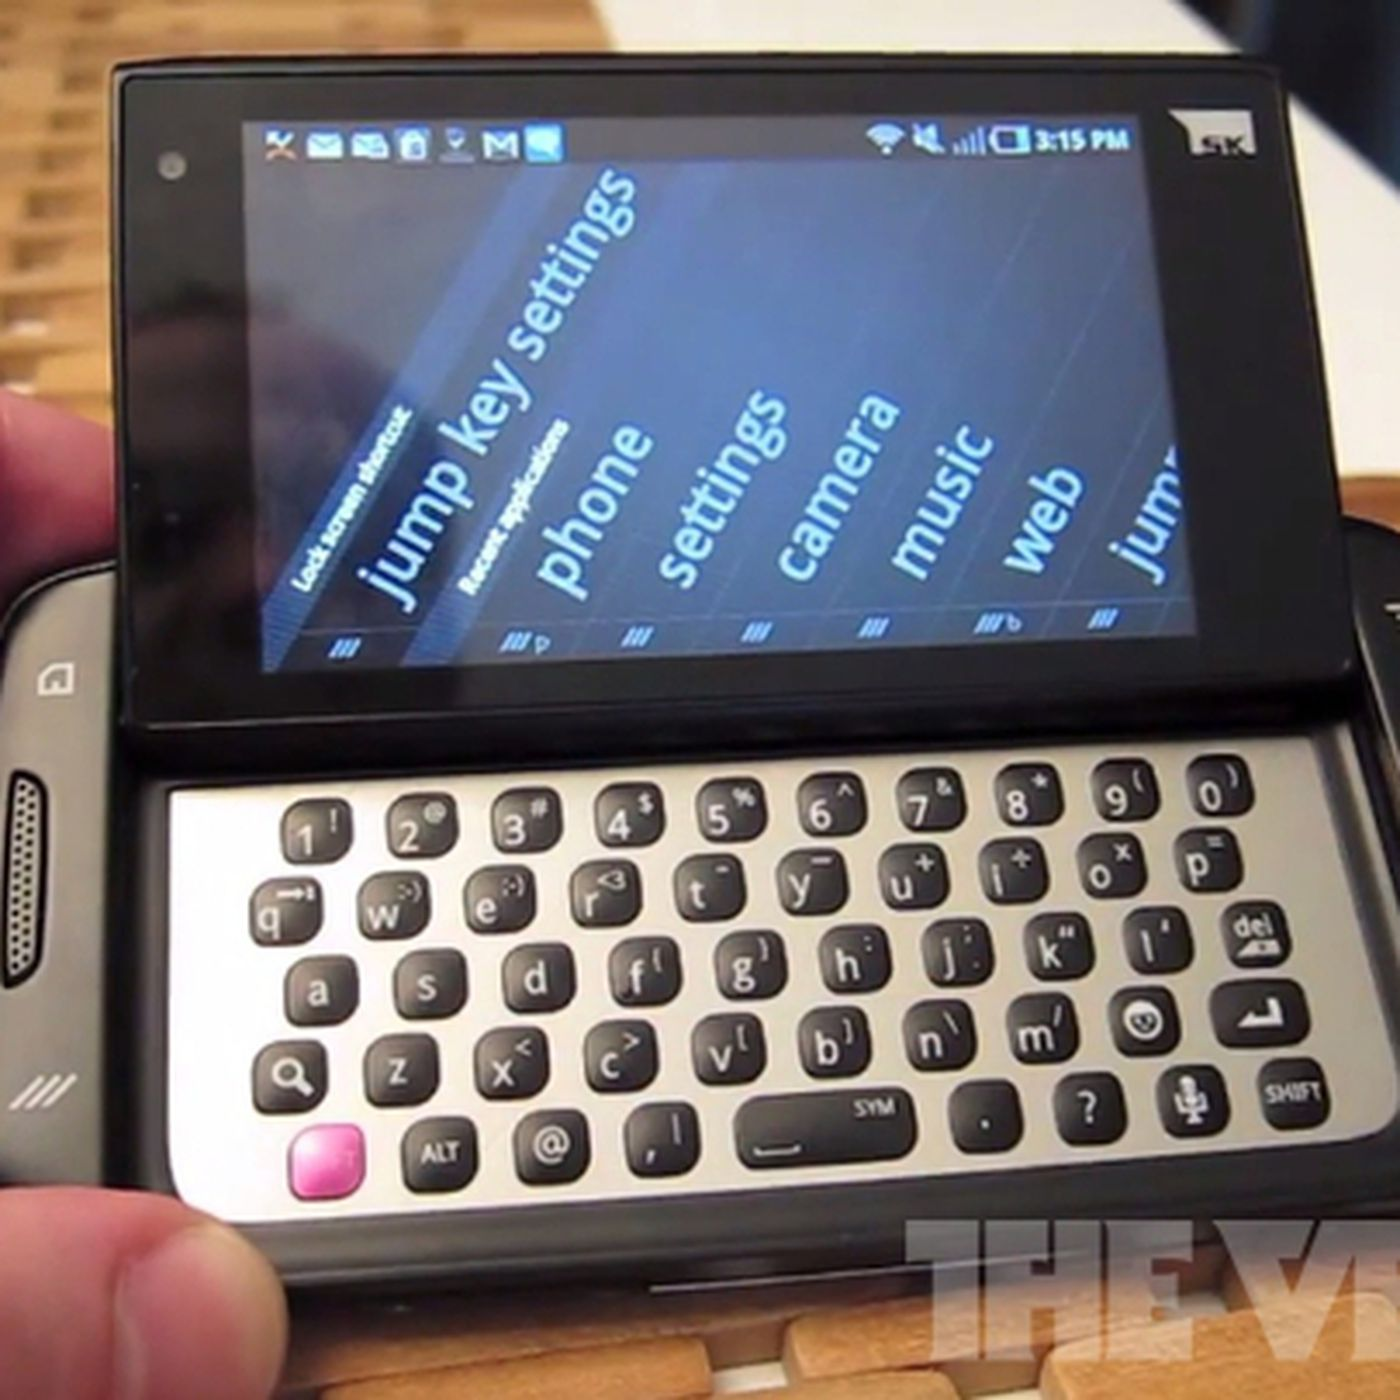 Samsung sidekick 4g usb driver, software updates & user manuals.